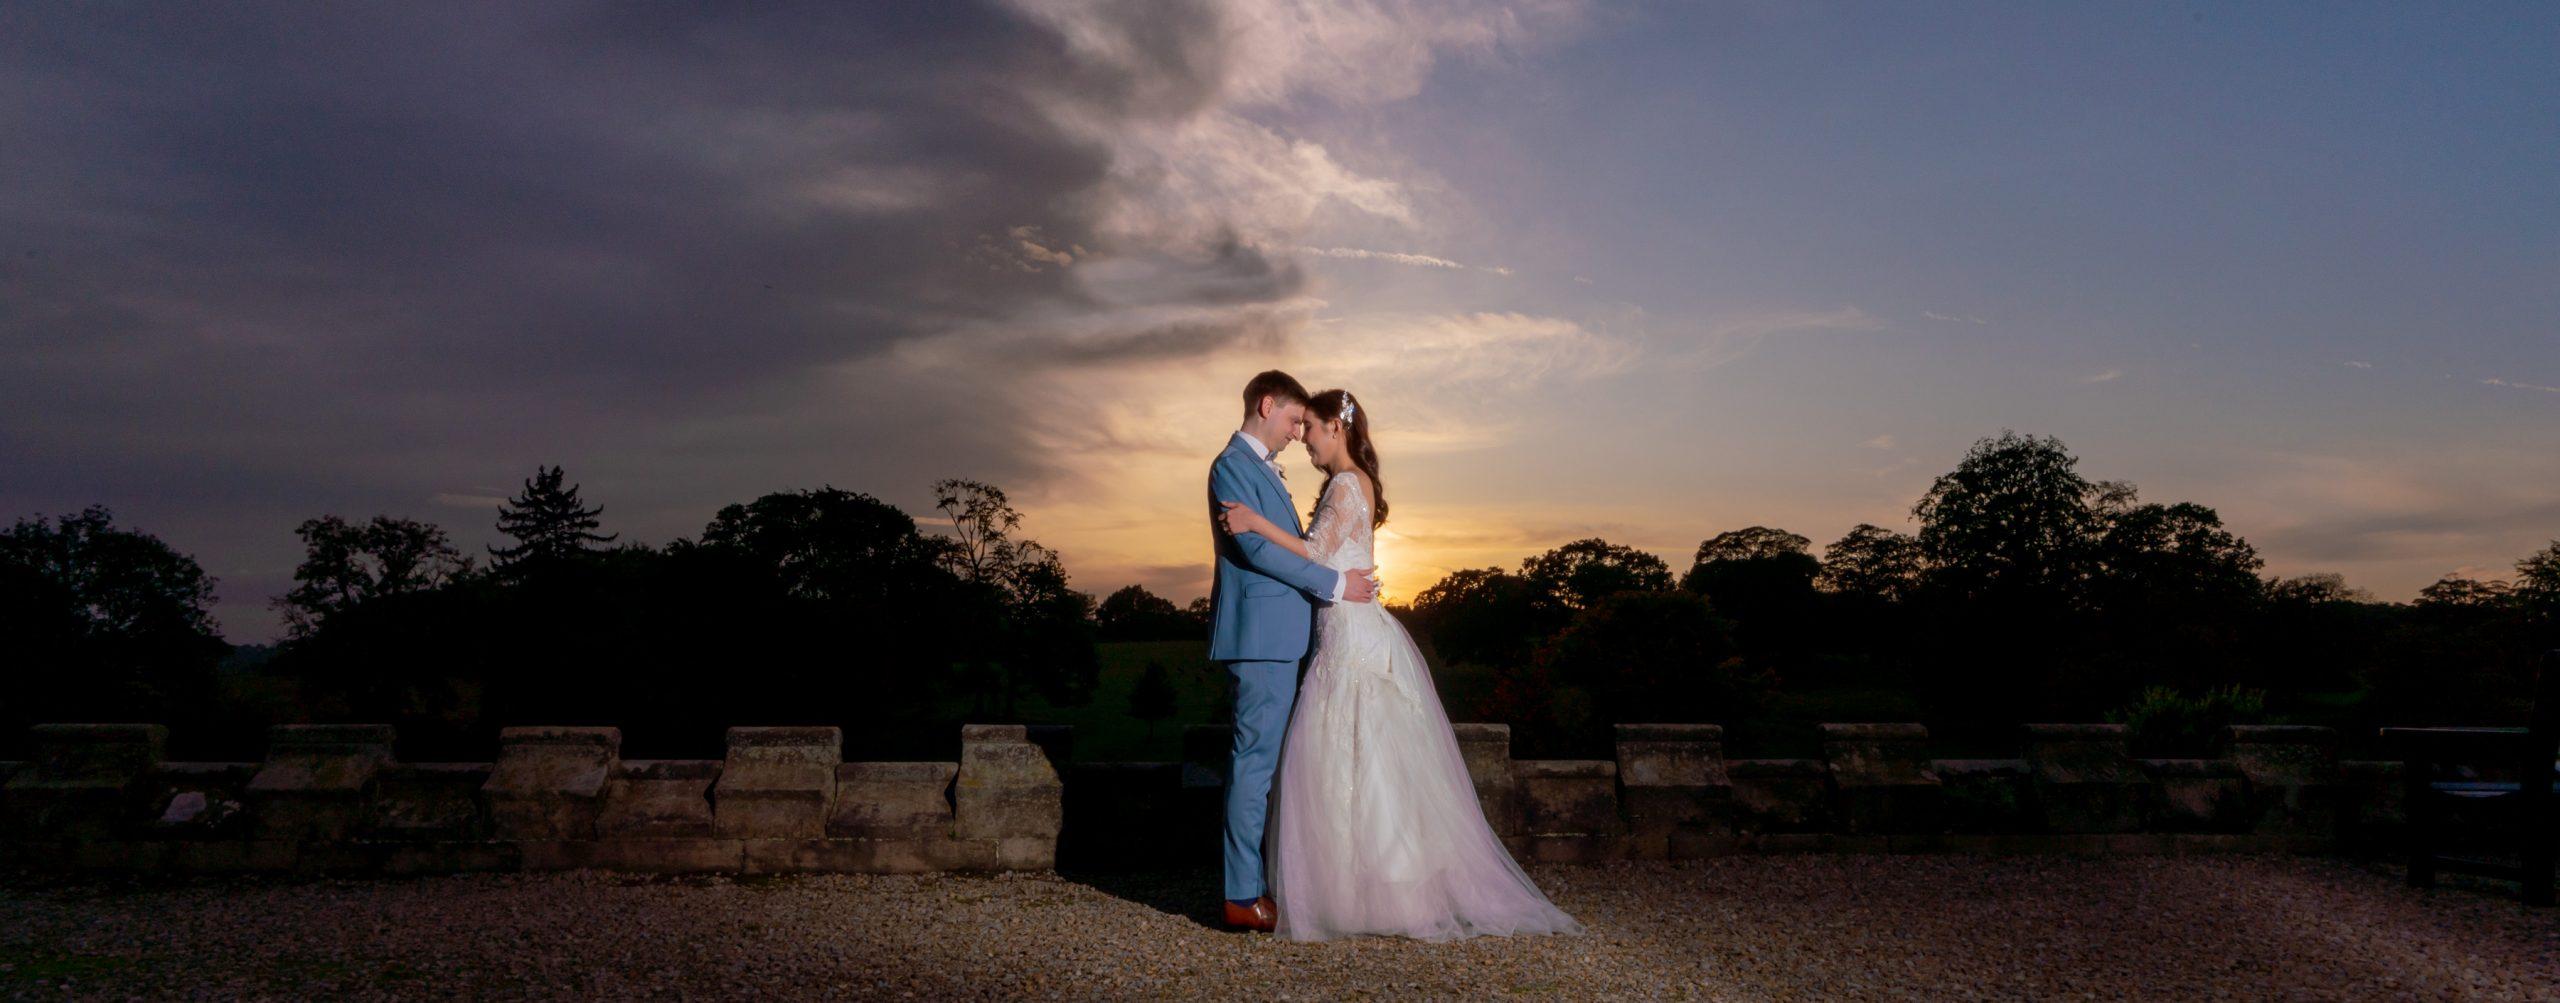 Ripley Castle Wedding Photography 3